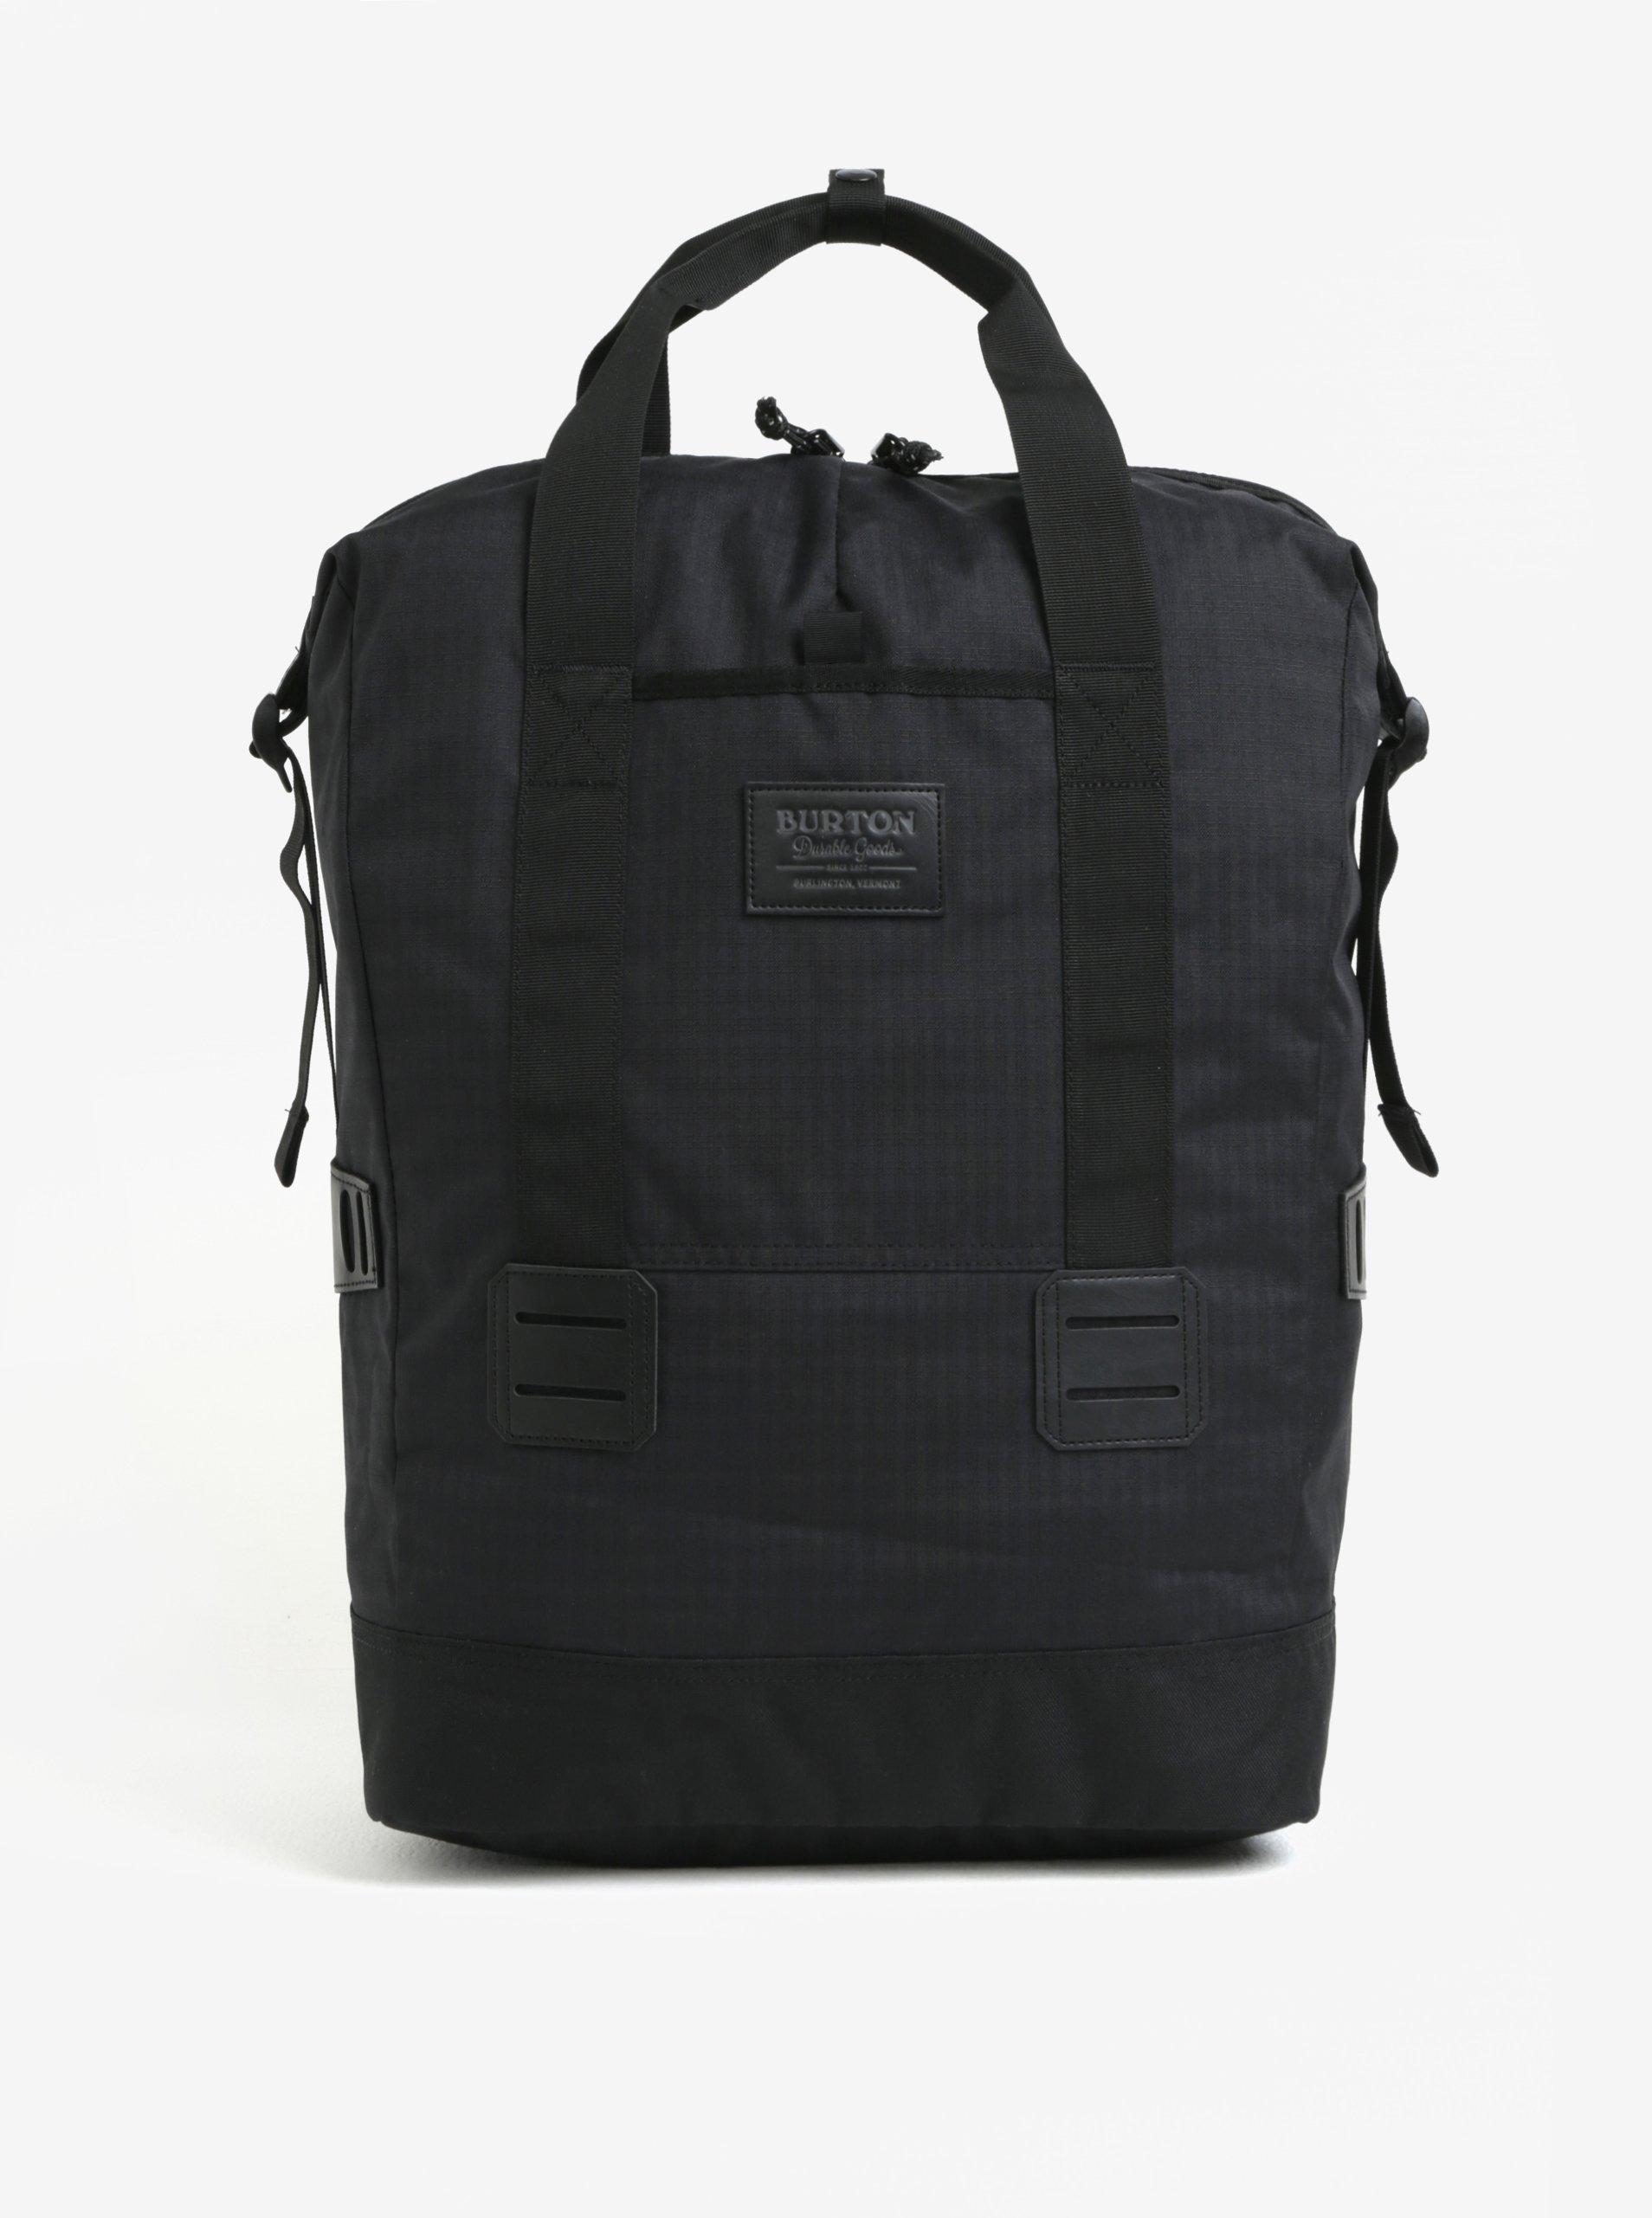 Čierny batoh/taška Burton Tinder tote 25 l